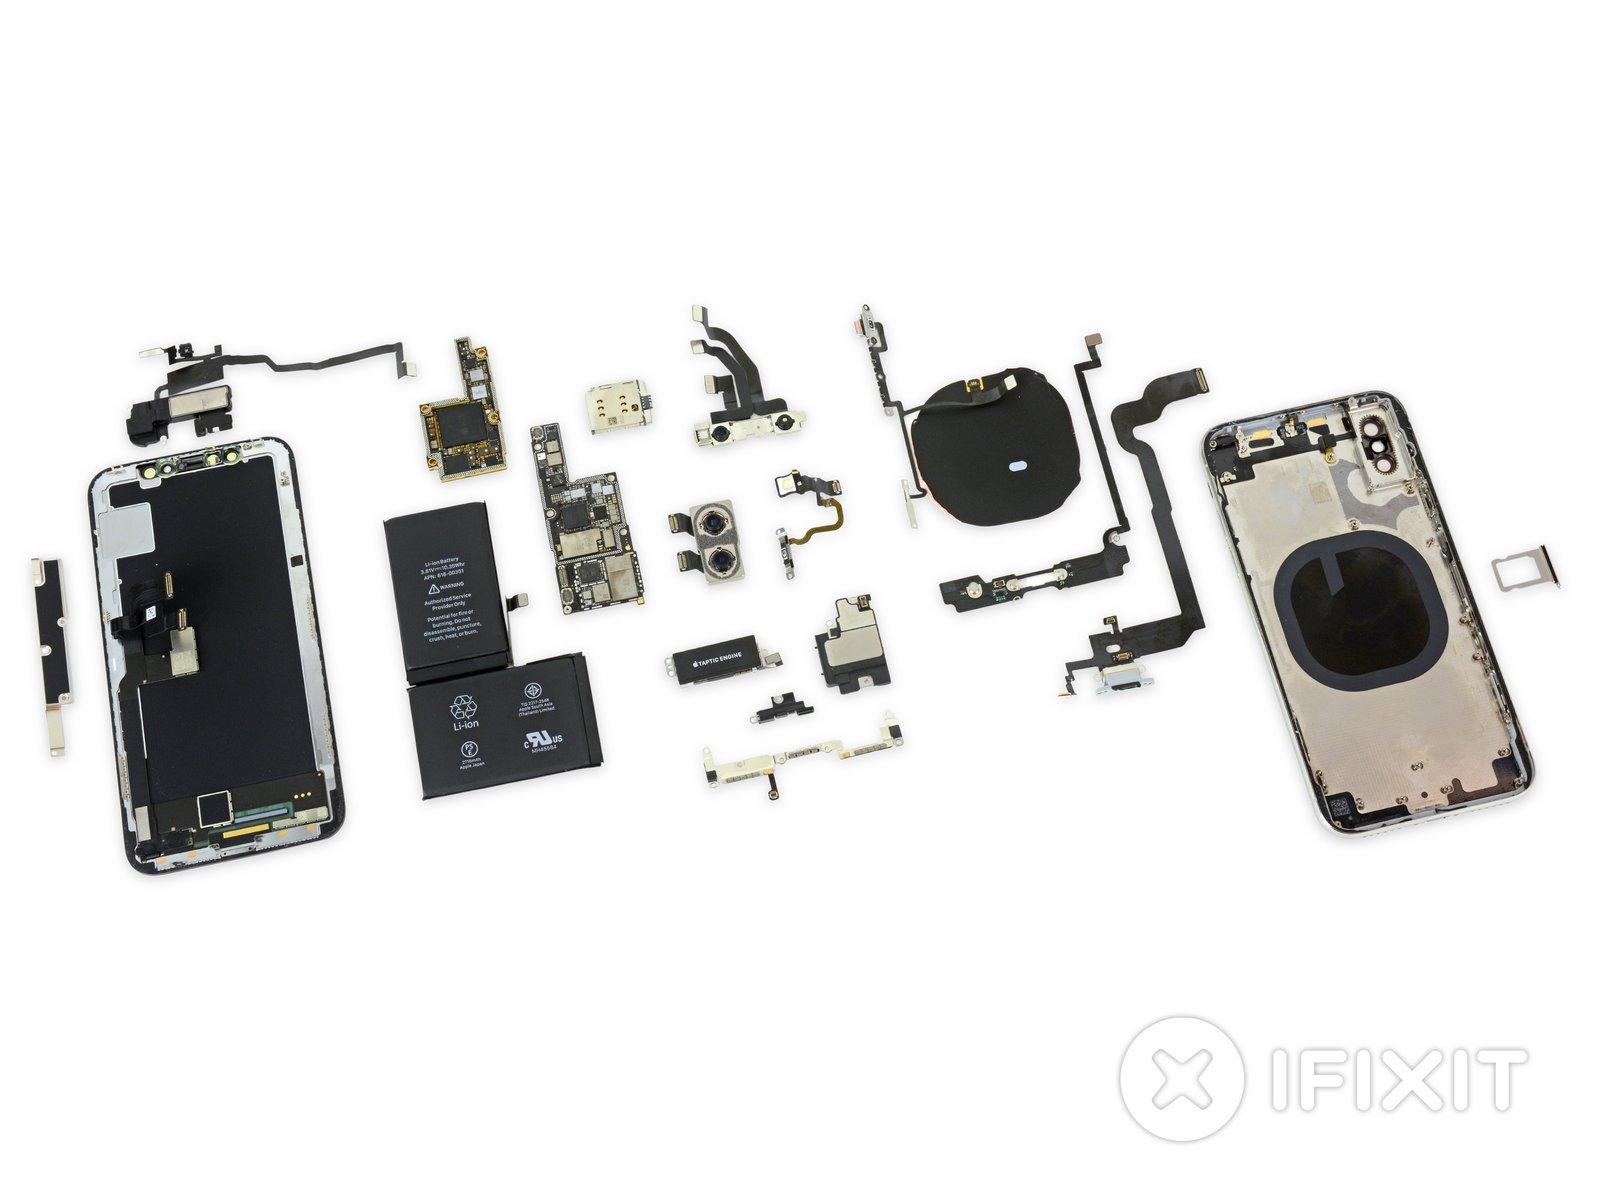 iPhone X Teardown - iFixit